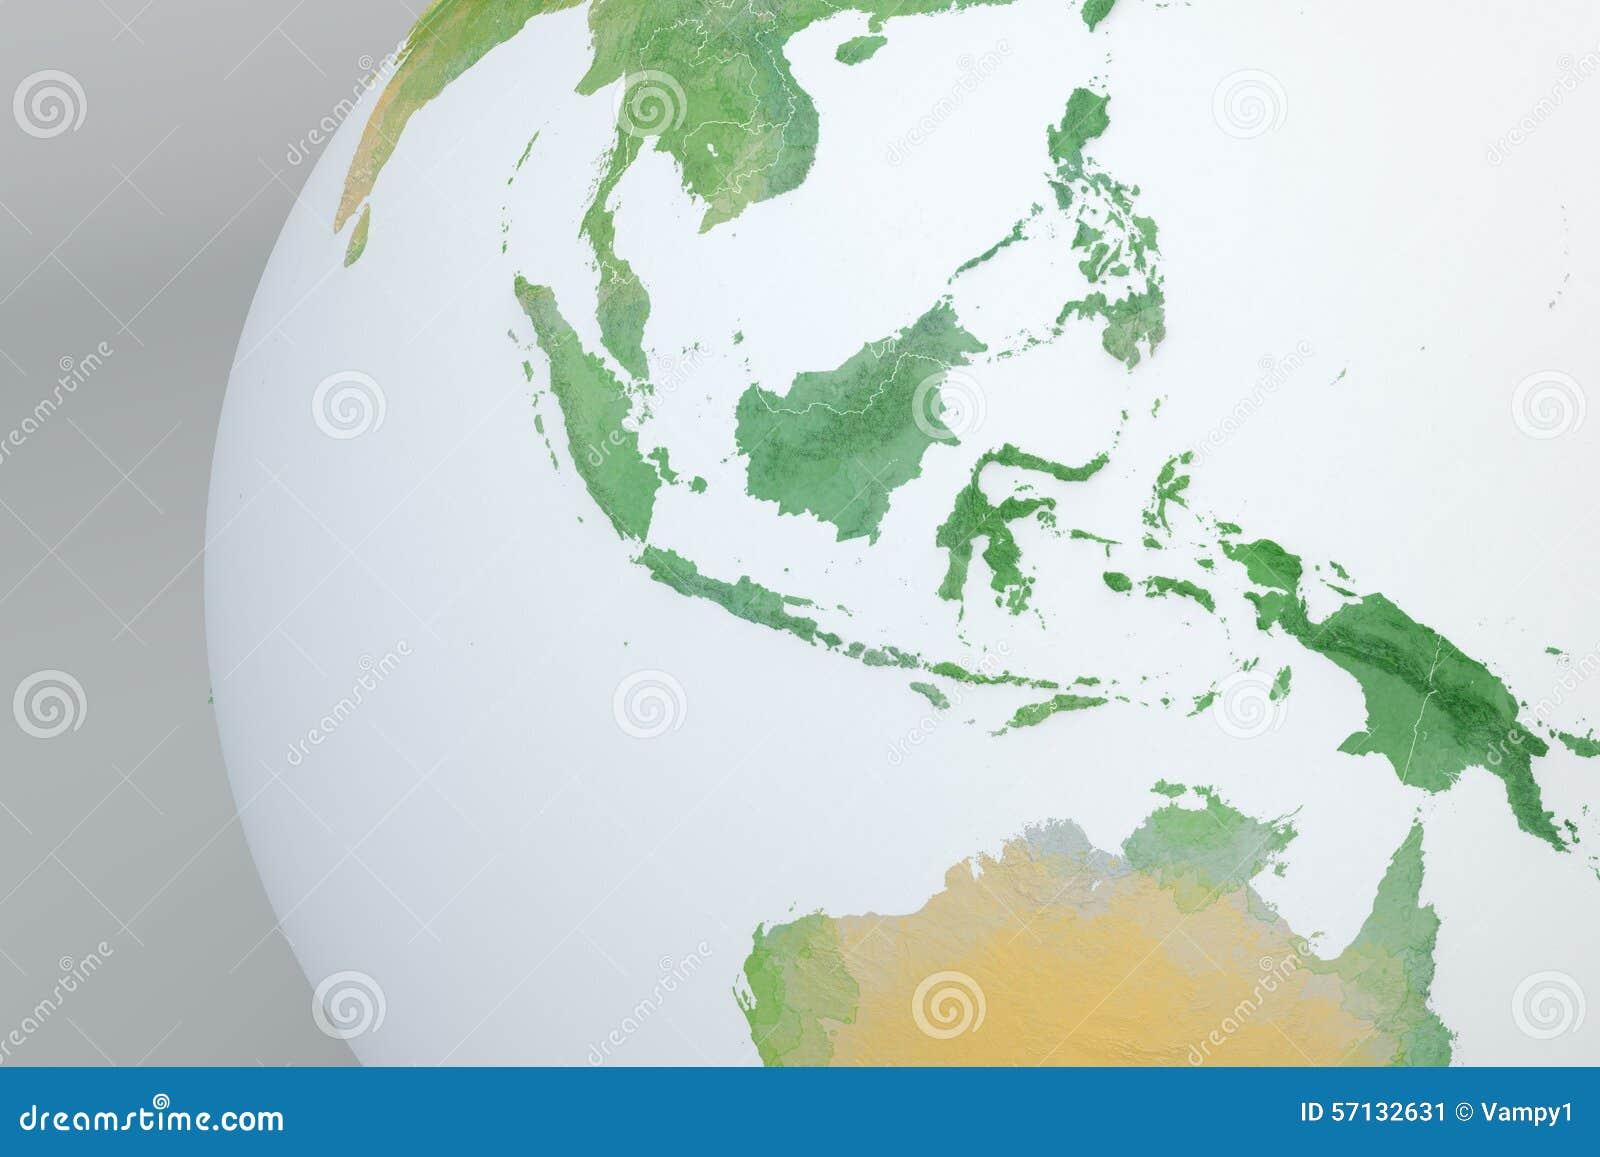 Globe Map Of Asia, Indonesia, Malaysia, Australia, Relief Map Stock ...